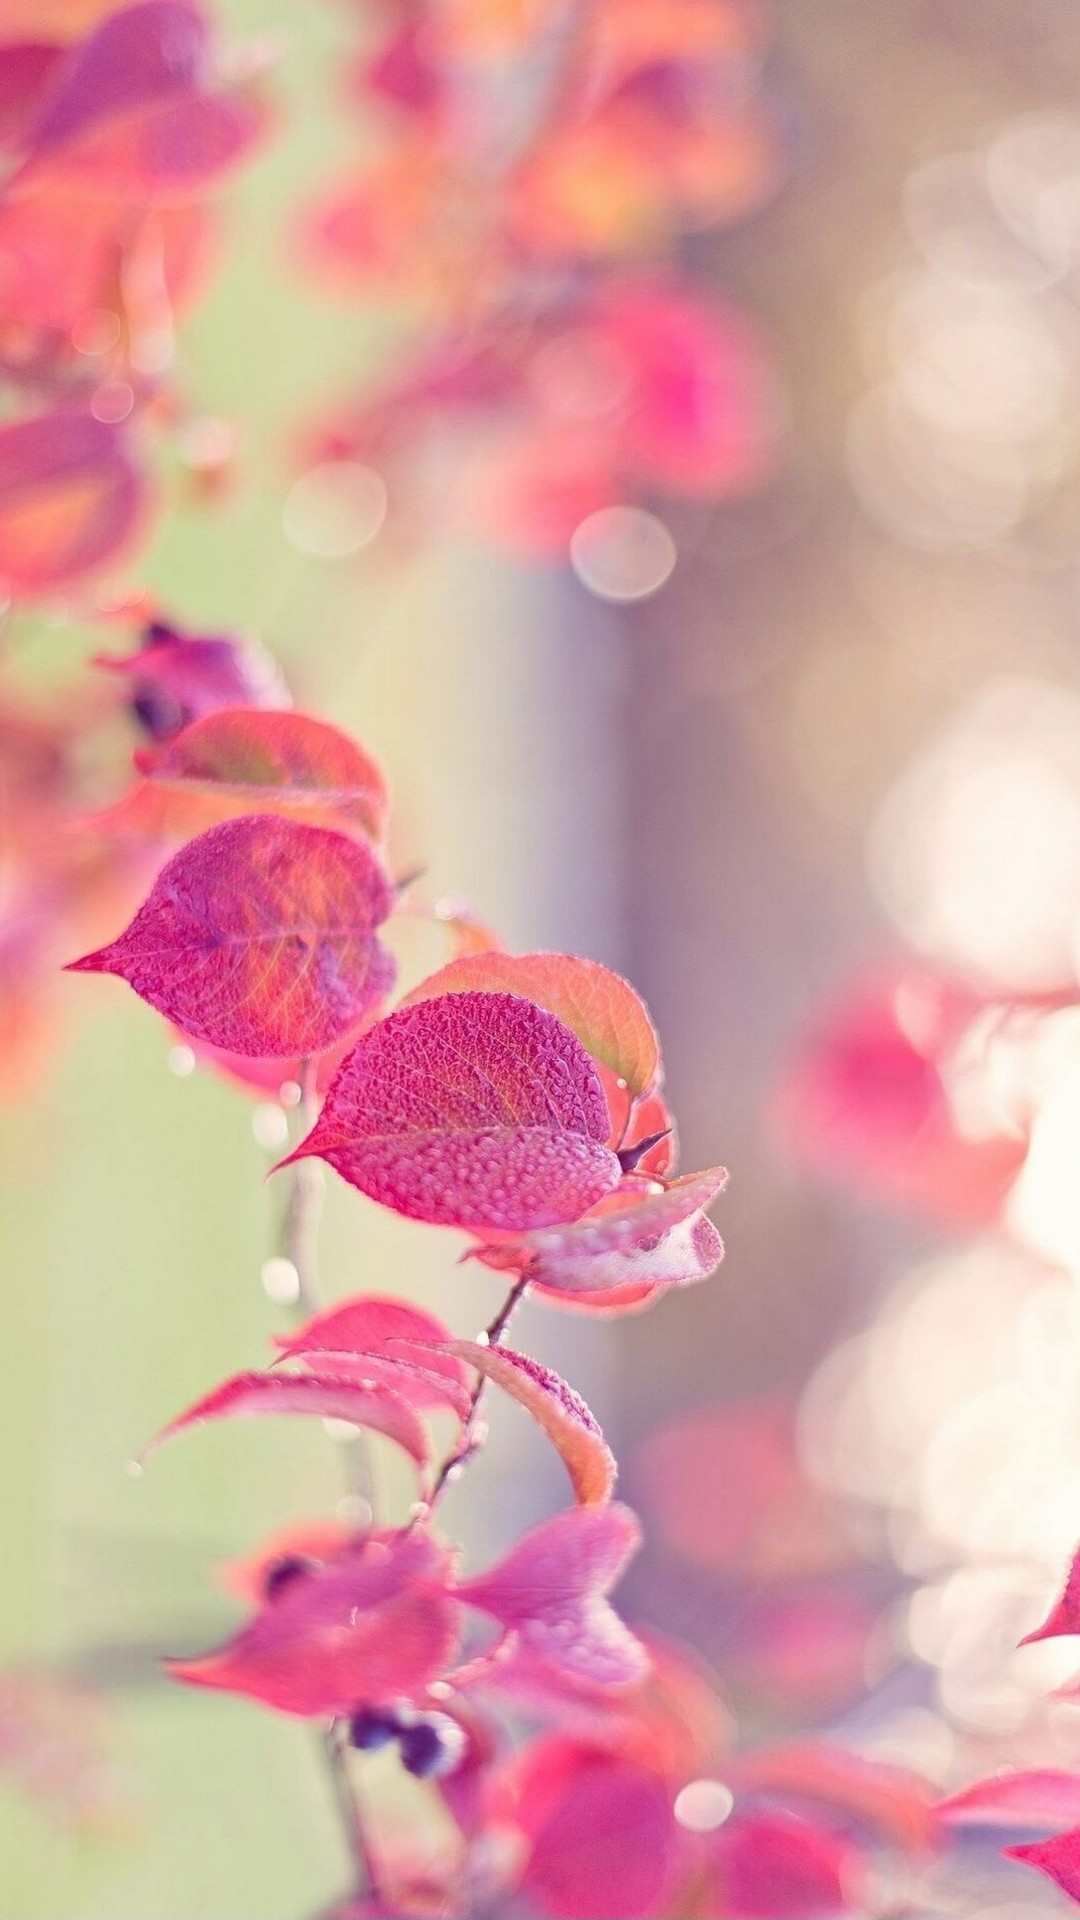 Leaf Wallpaper Quote Mac Pink Wallpaper Iphone Hd 2019 Cute Wallpapers